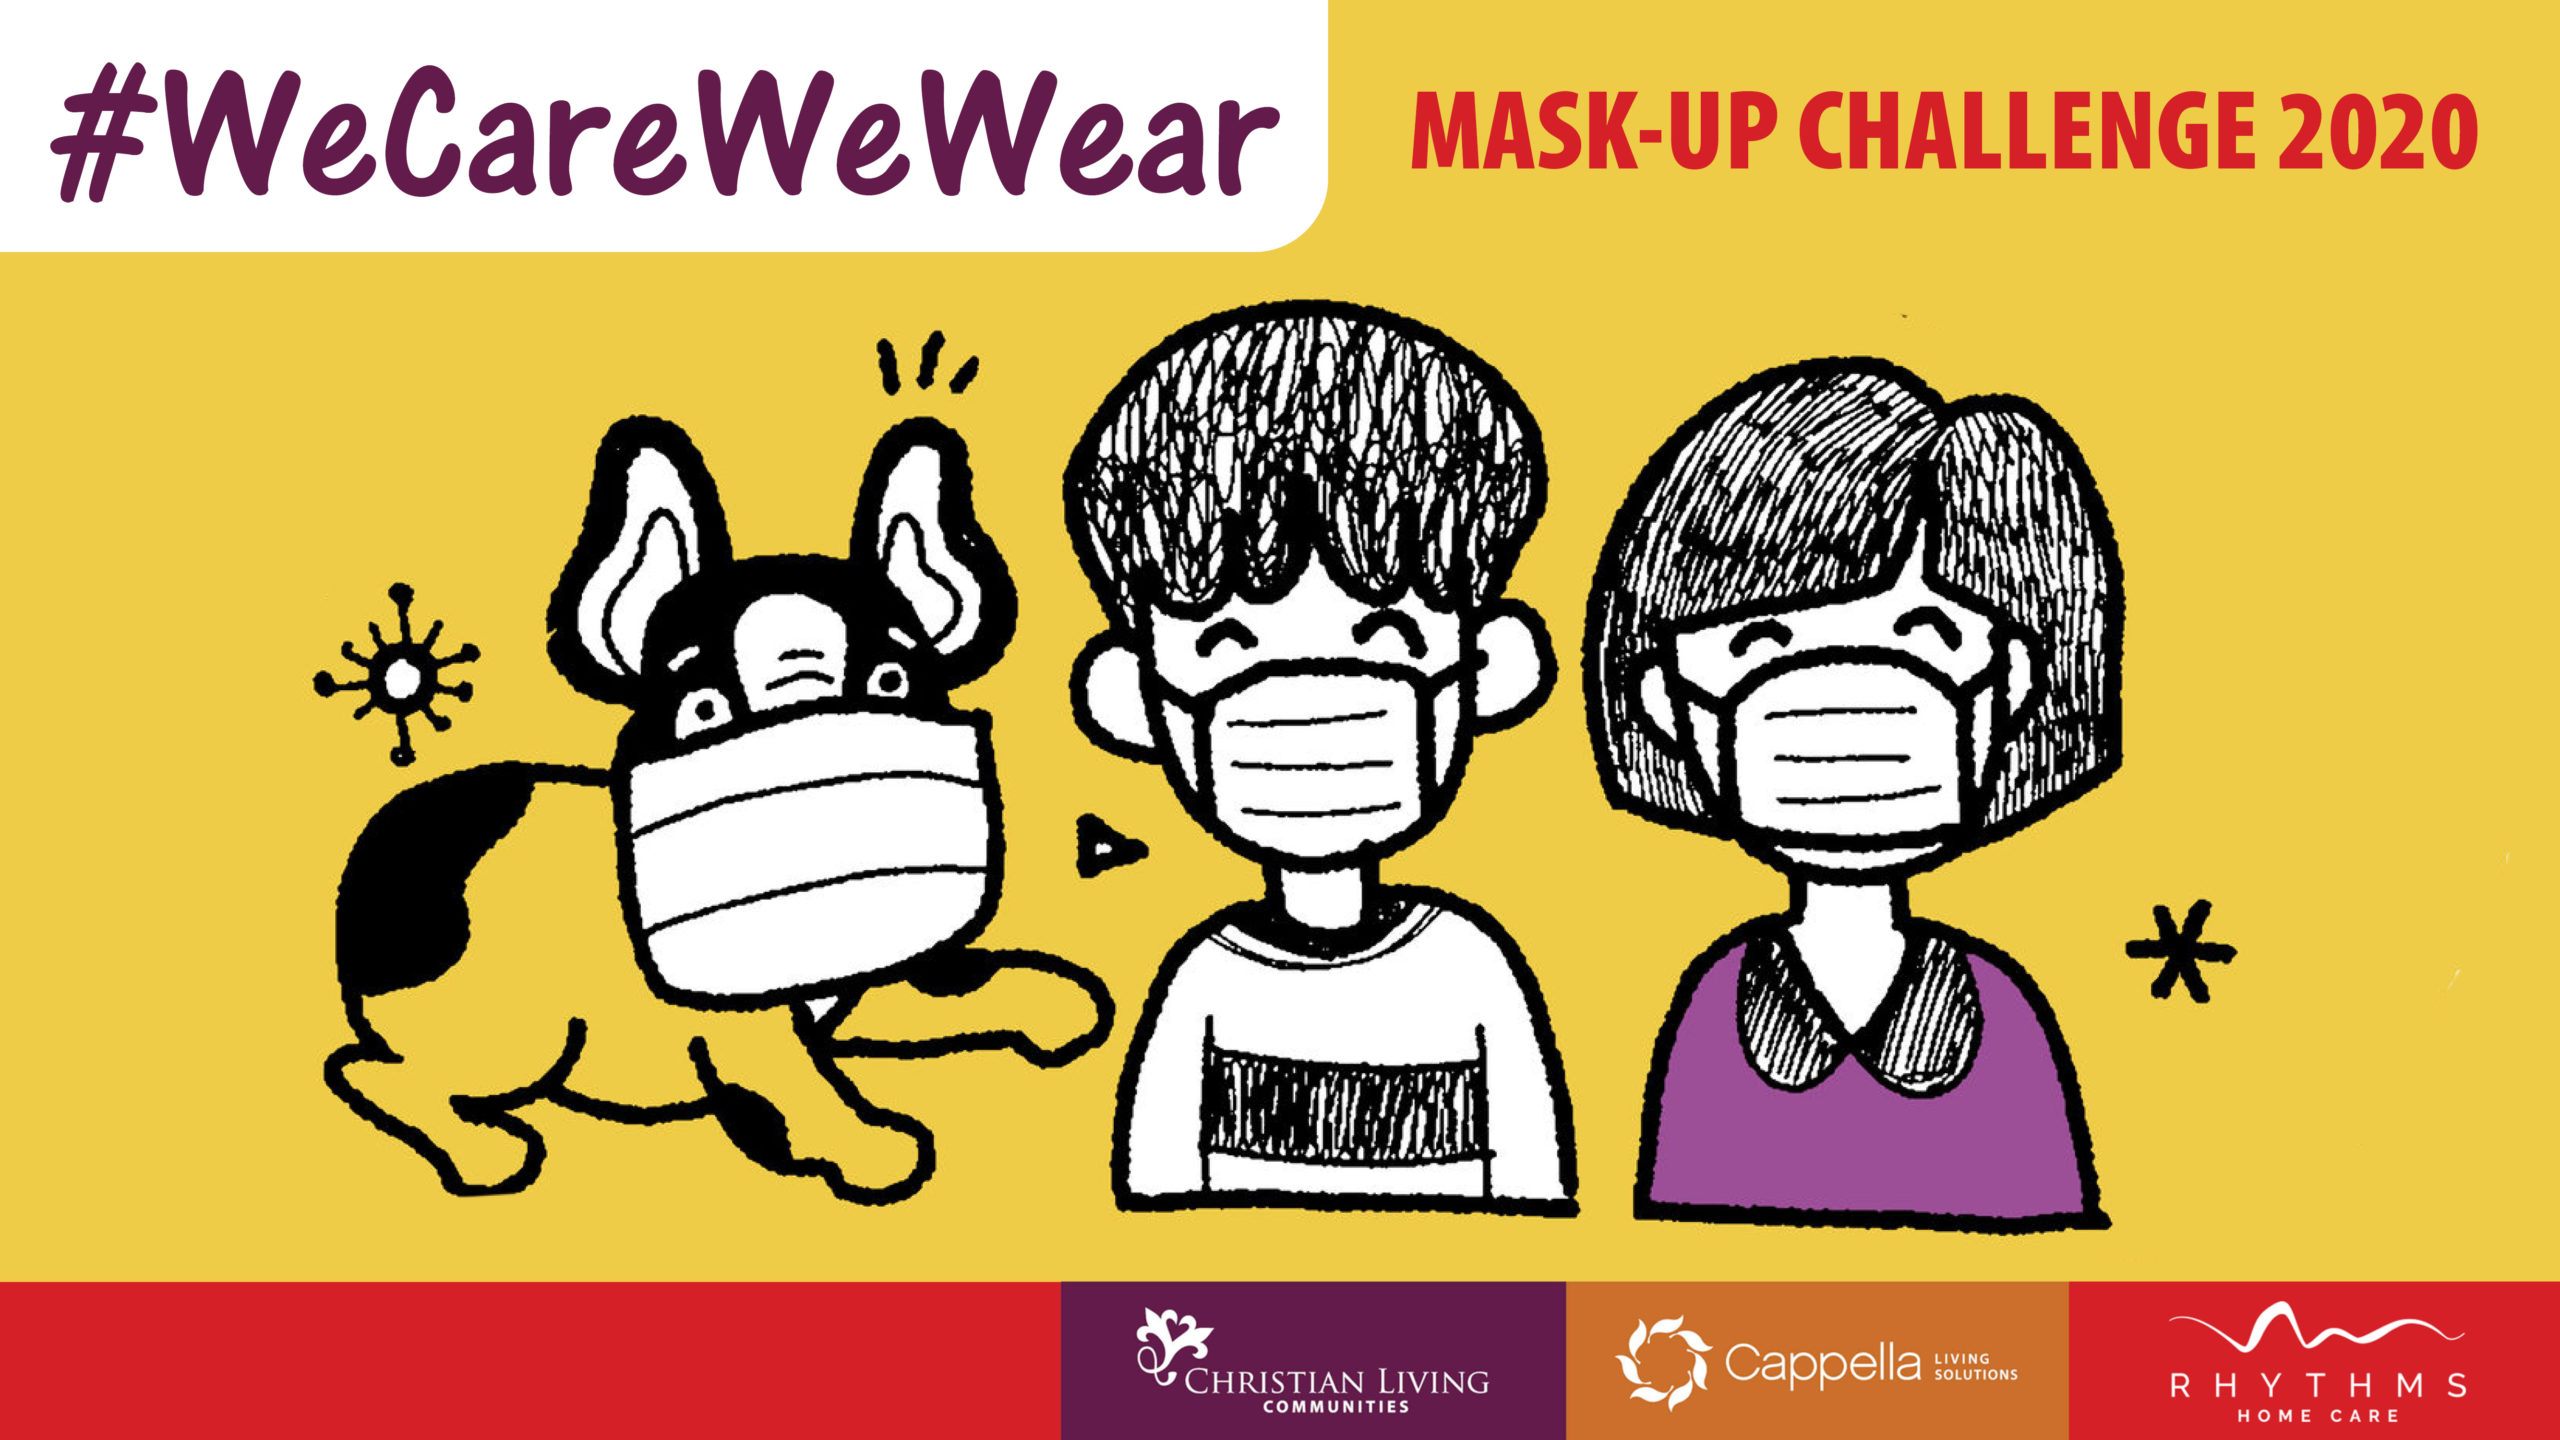 We Care We Wear Mask challenge poster